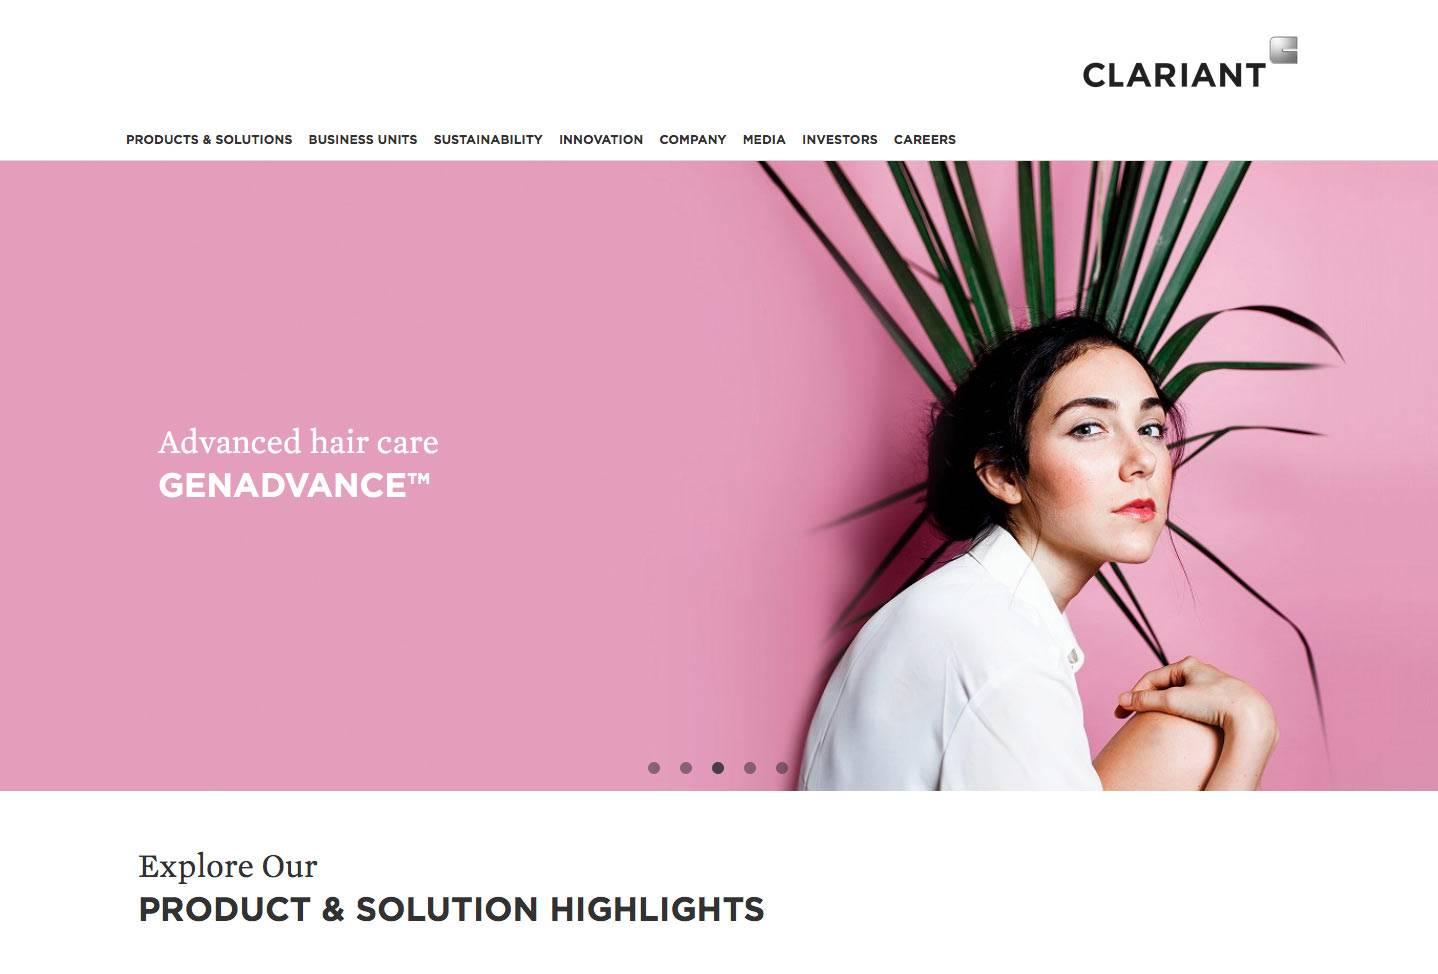 clariant-banner